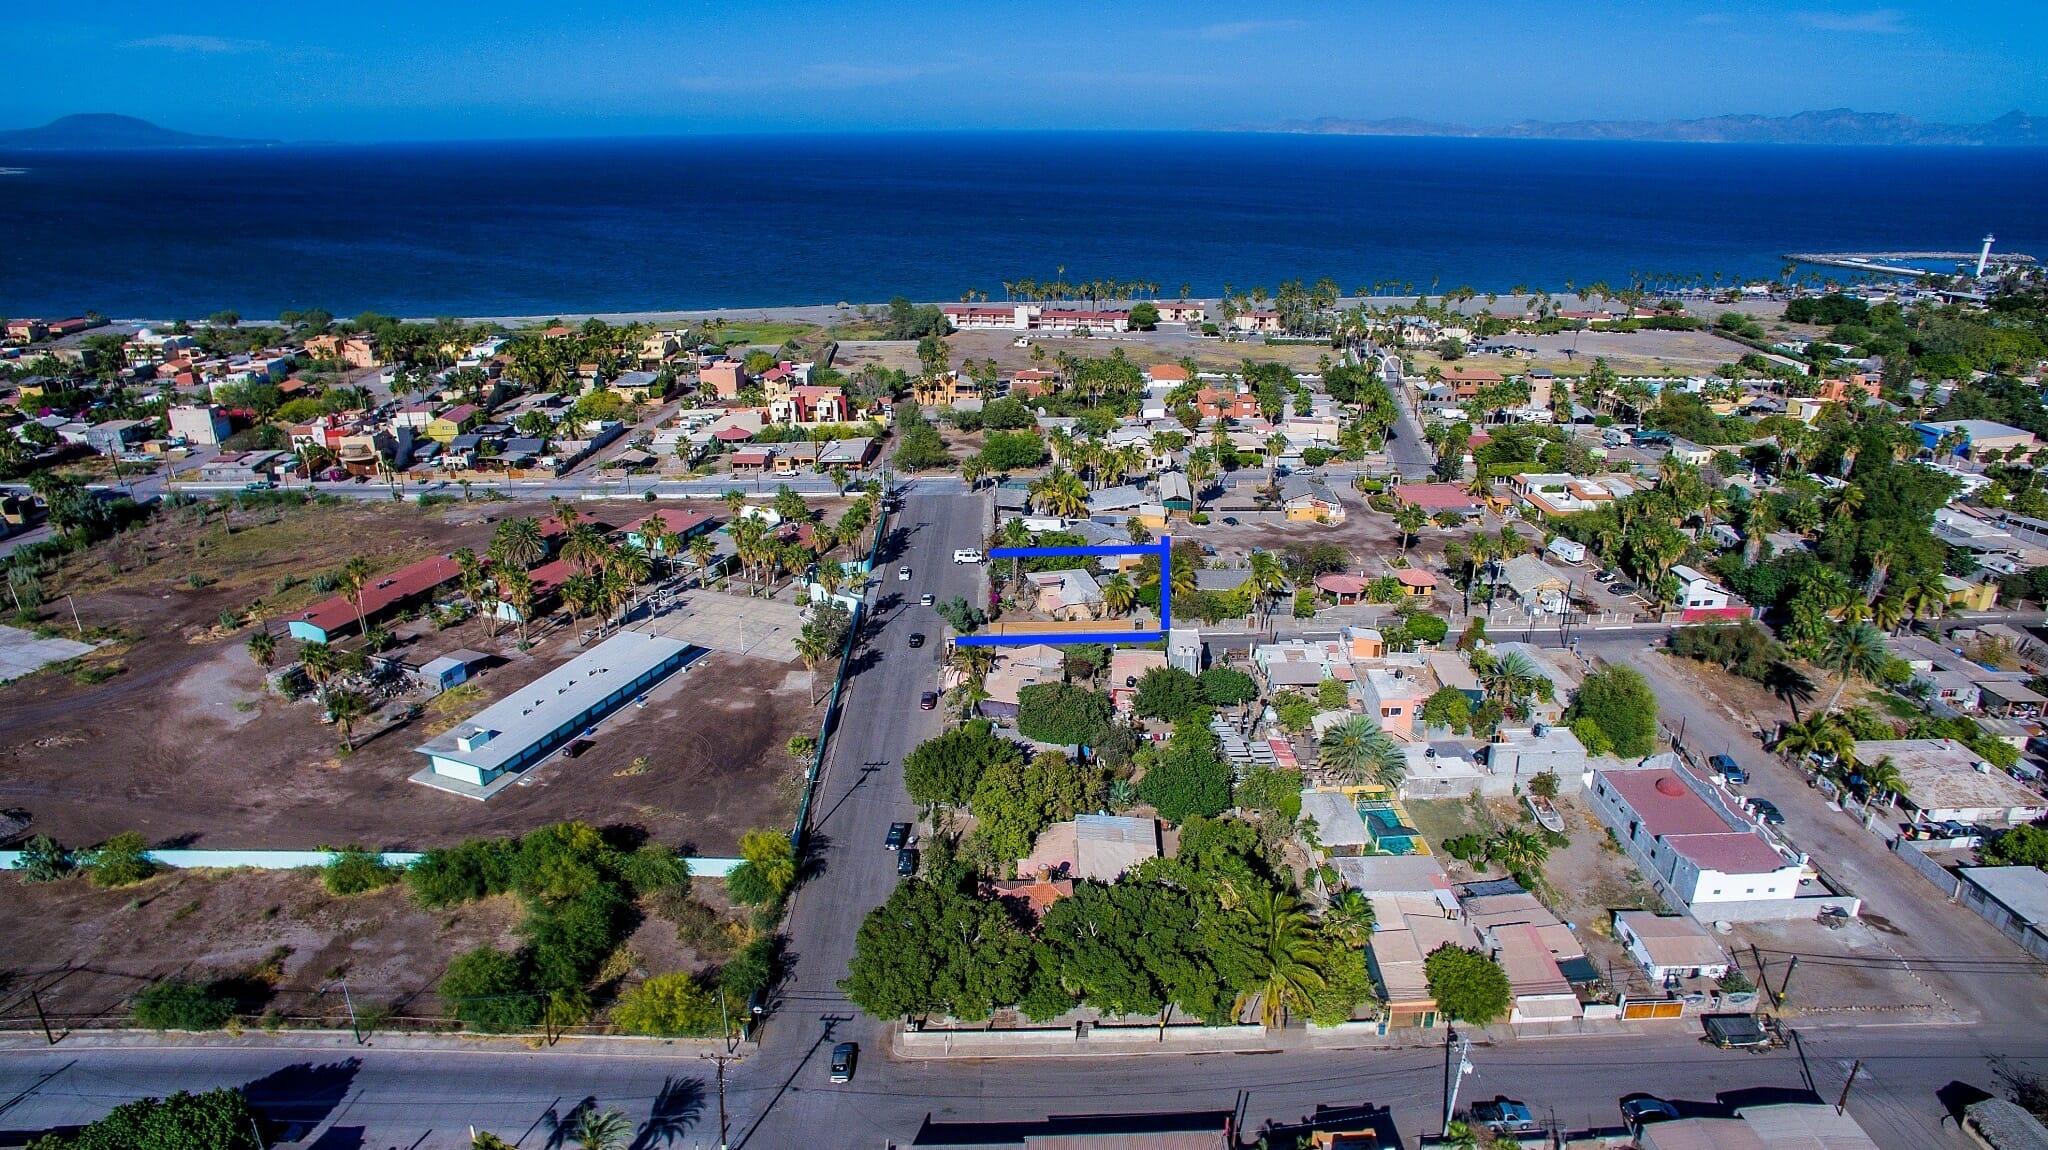 Home for sale in Nopolo, Loreto Baja Sur, Move in Ready!: House for sale in Loreto